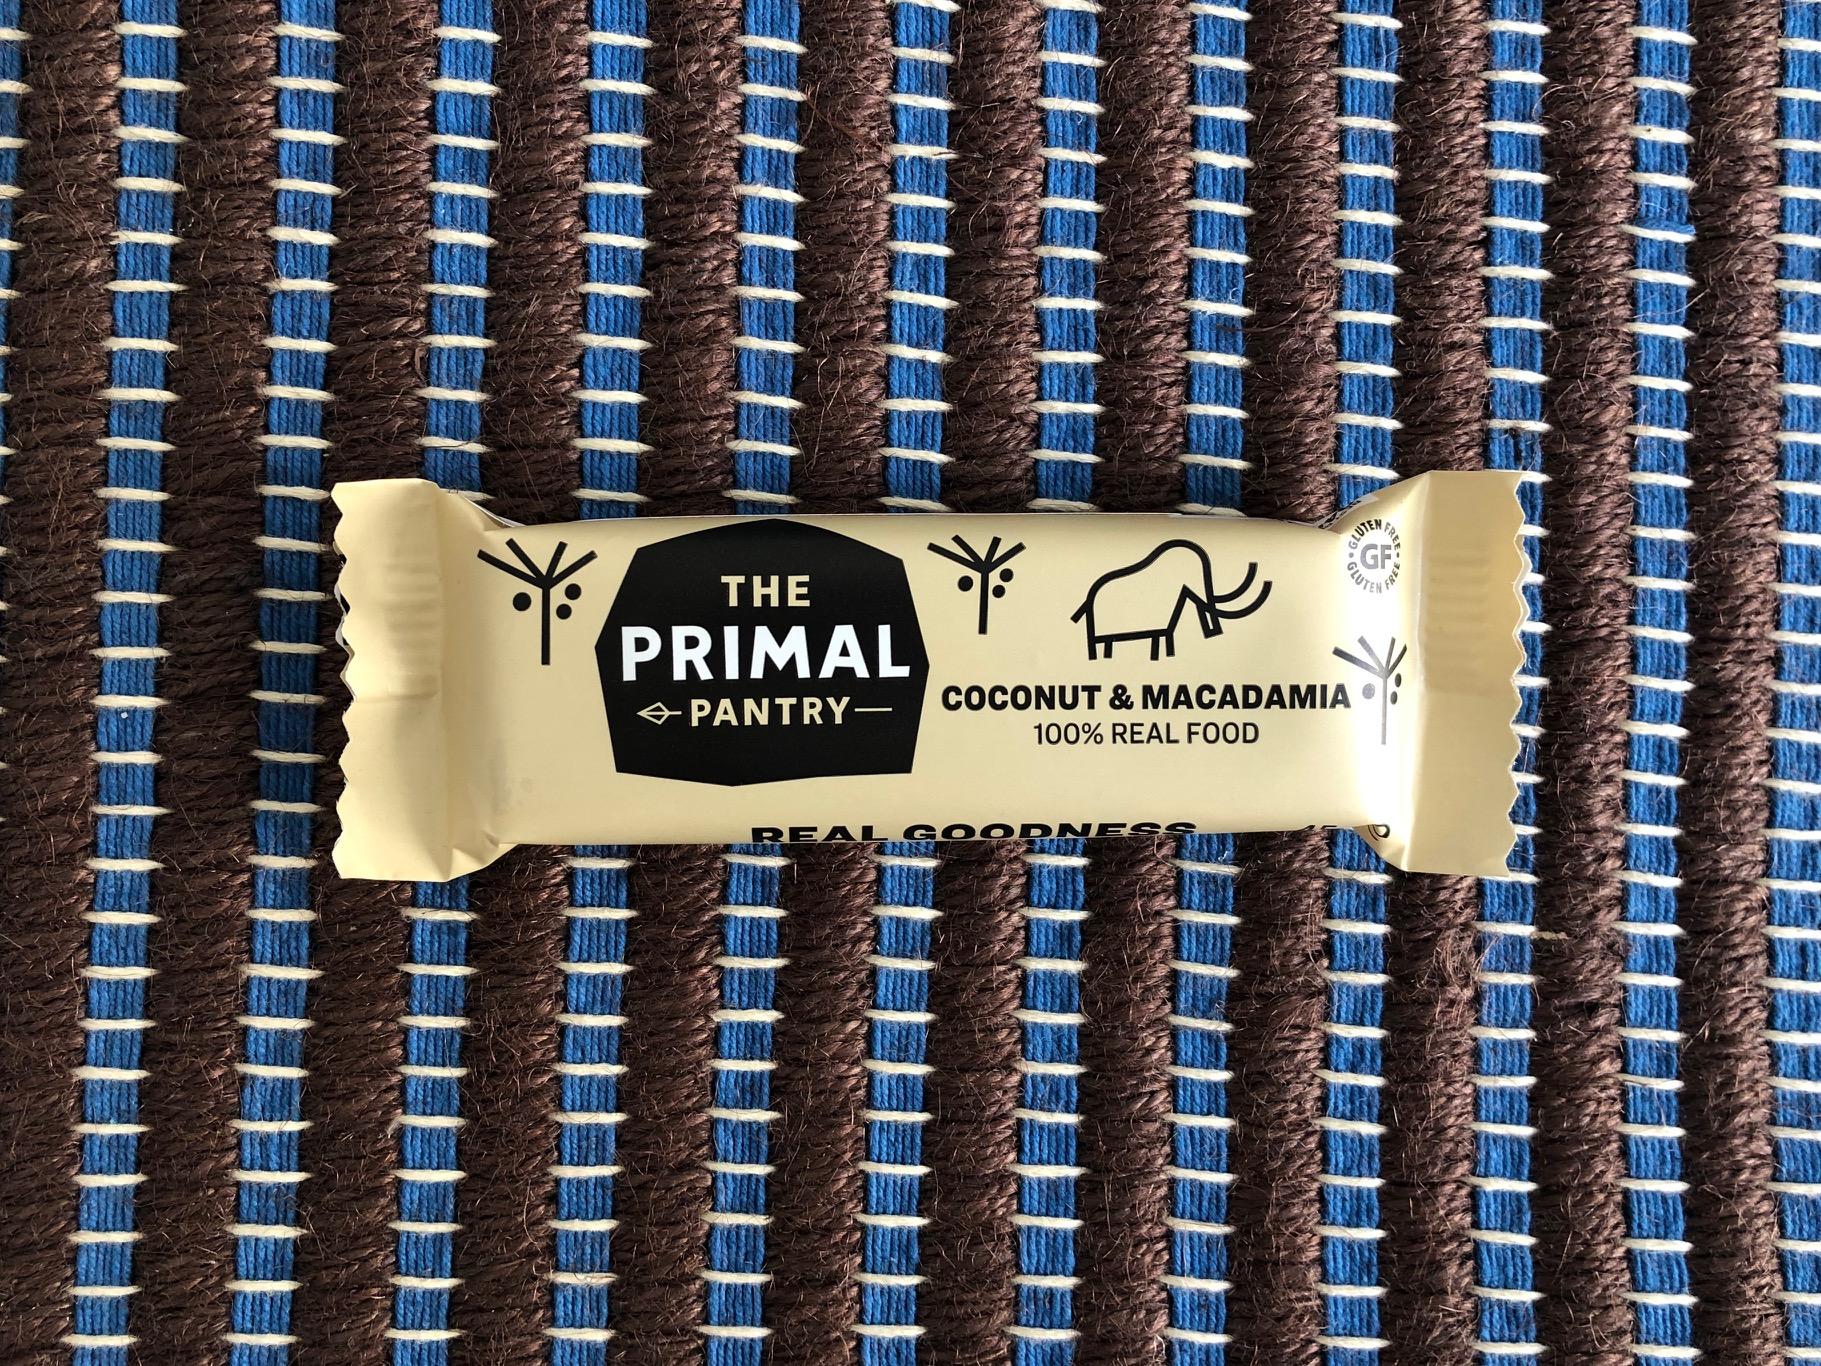 The-Primal-Pantry-Coconut-Macadamia